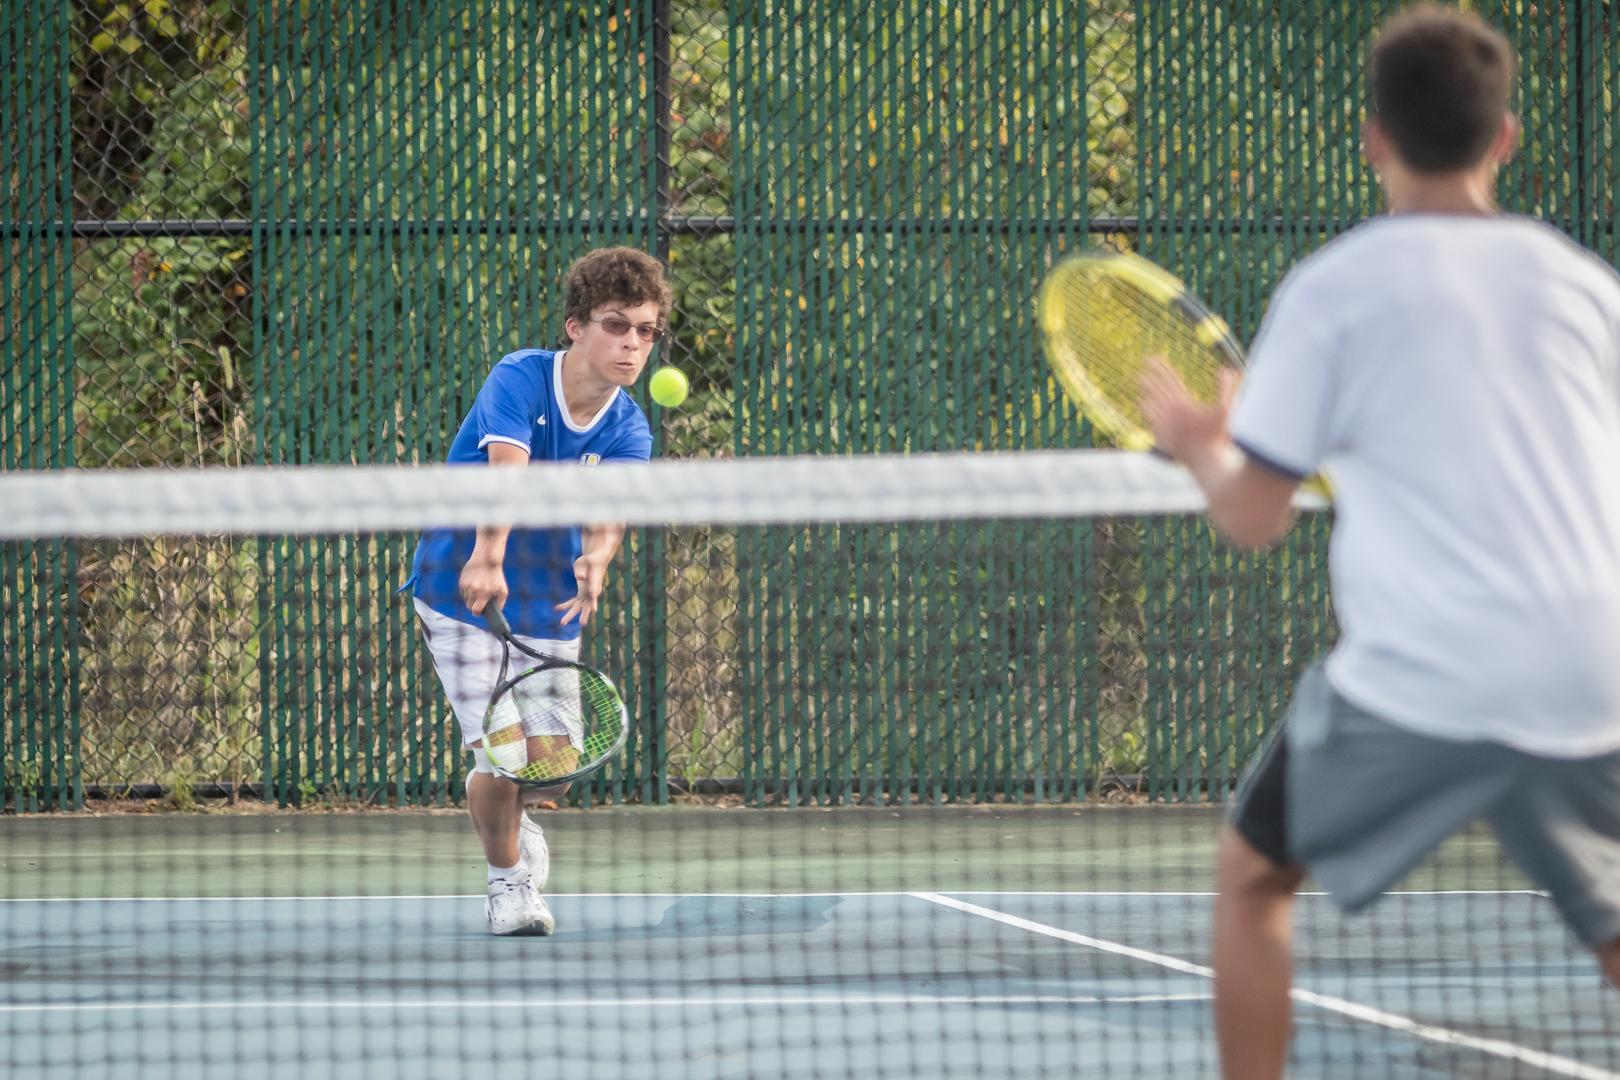 Marian-Boys-Tennis-1795.jpg